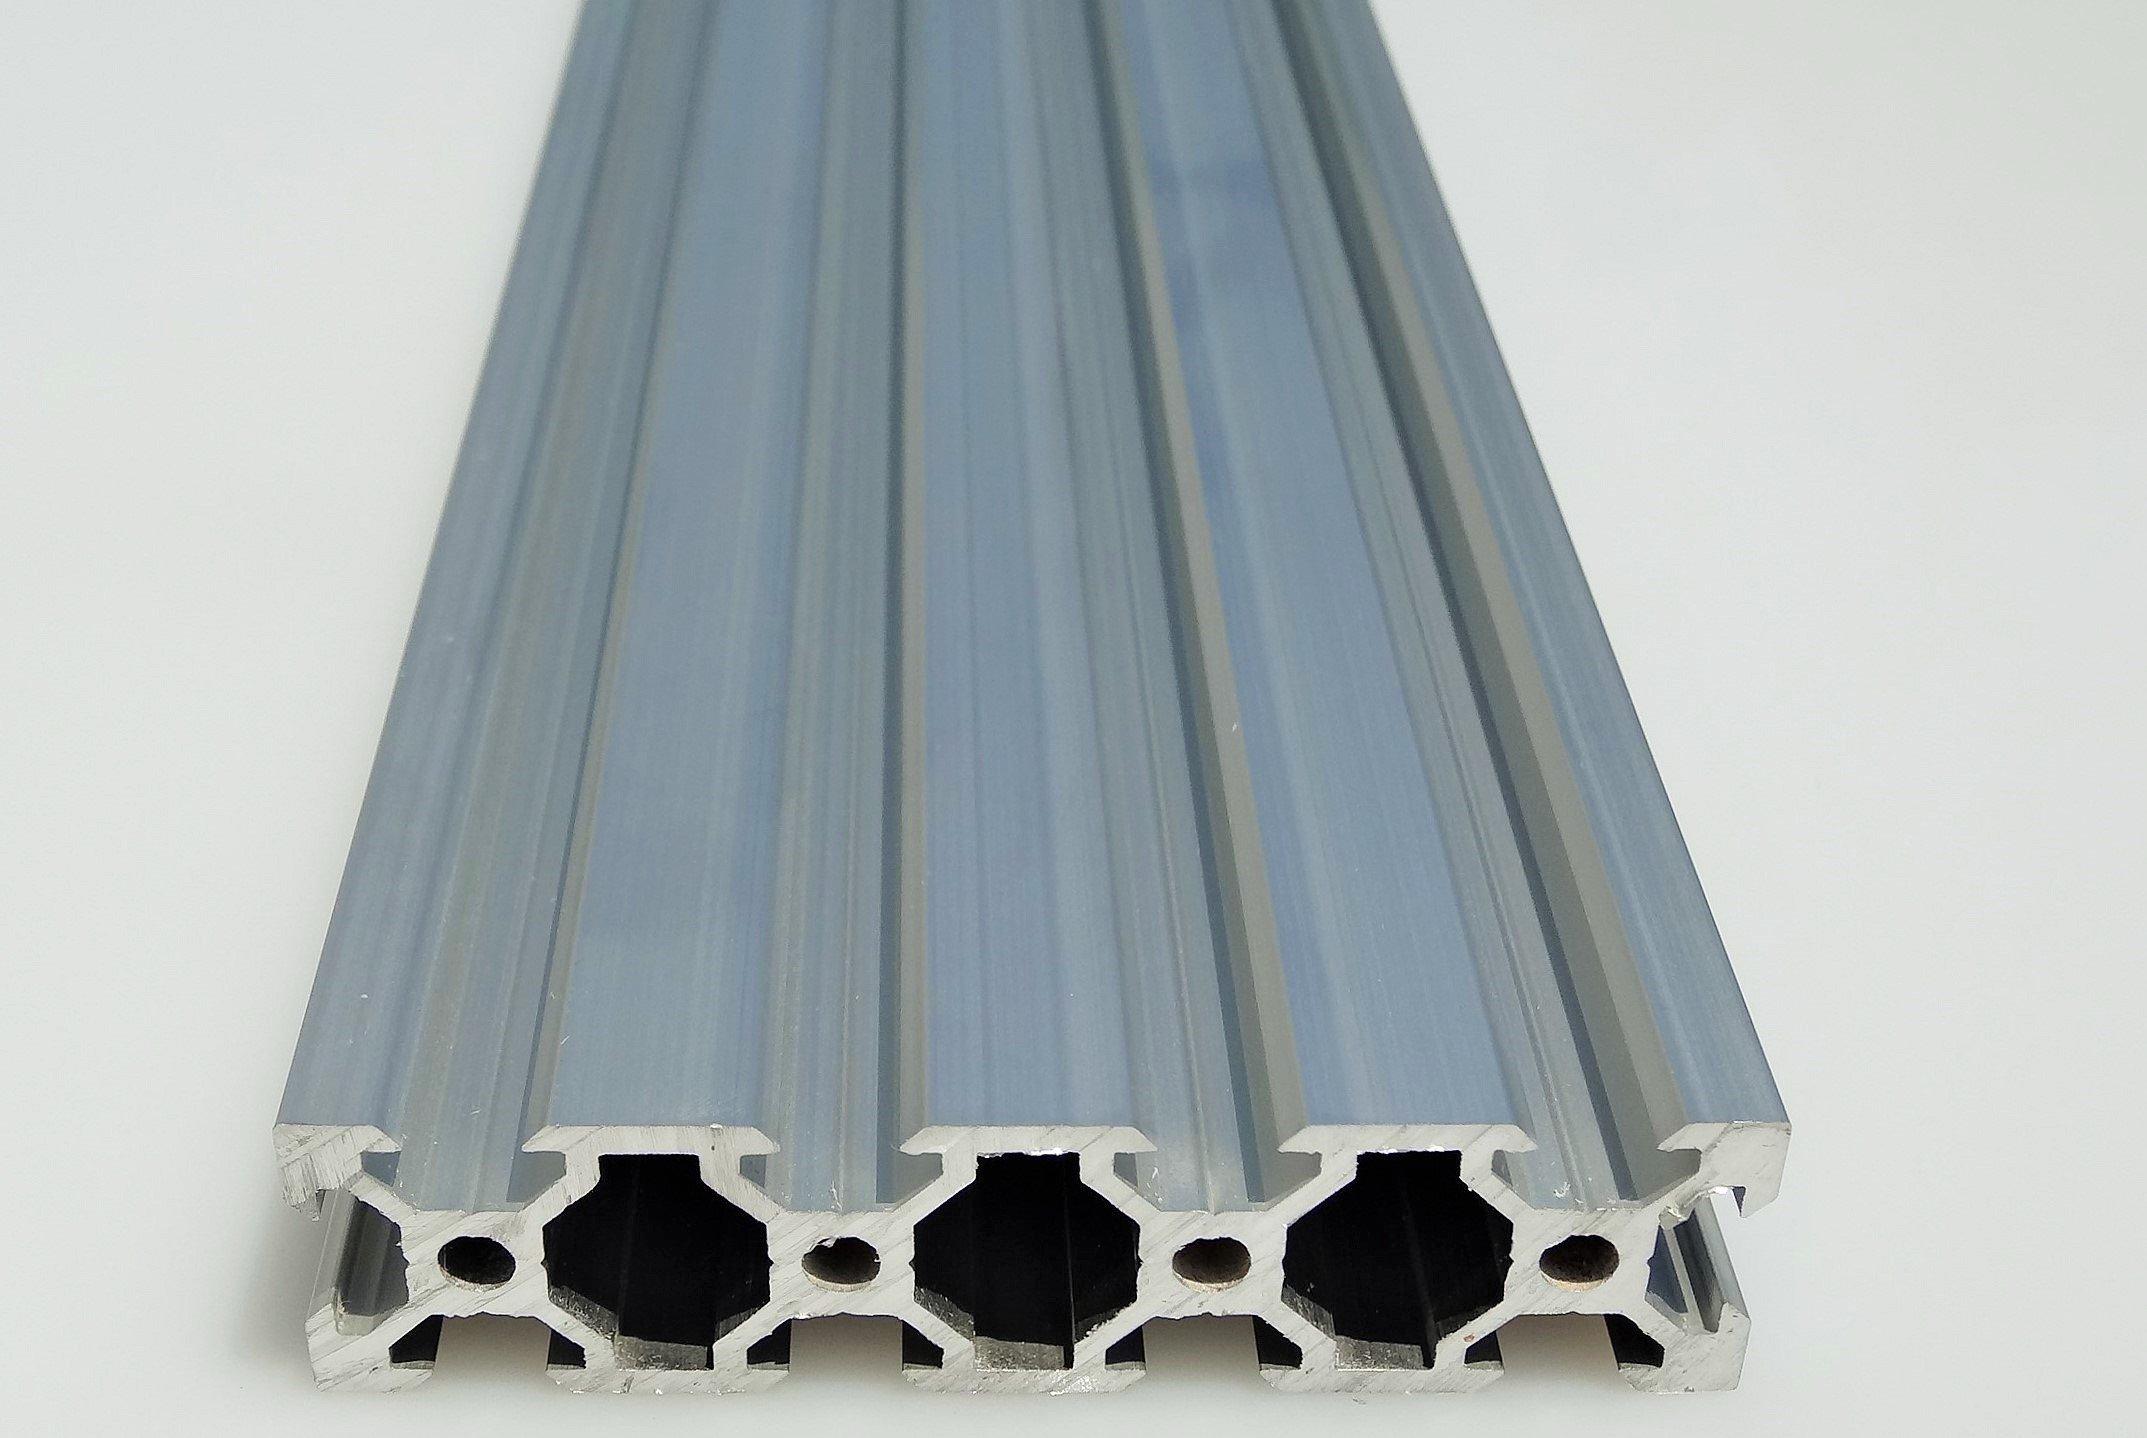 V-Slot Linear Rail - 1500mm Length (20mm x 80mm)